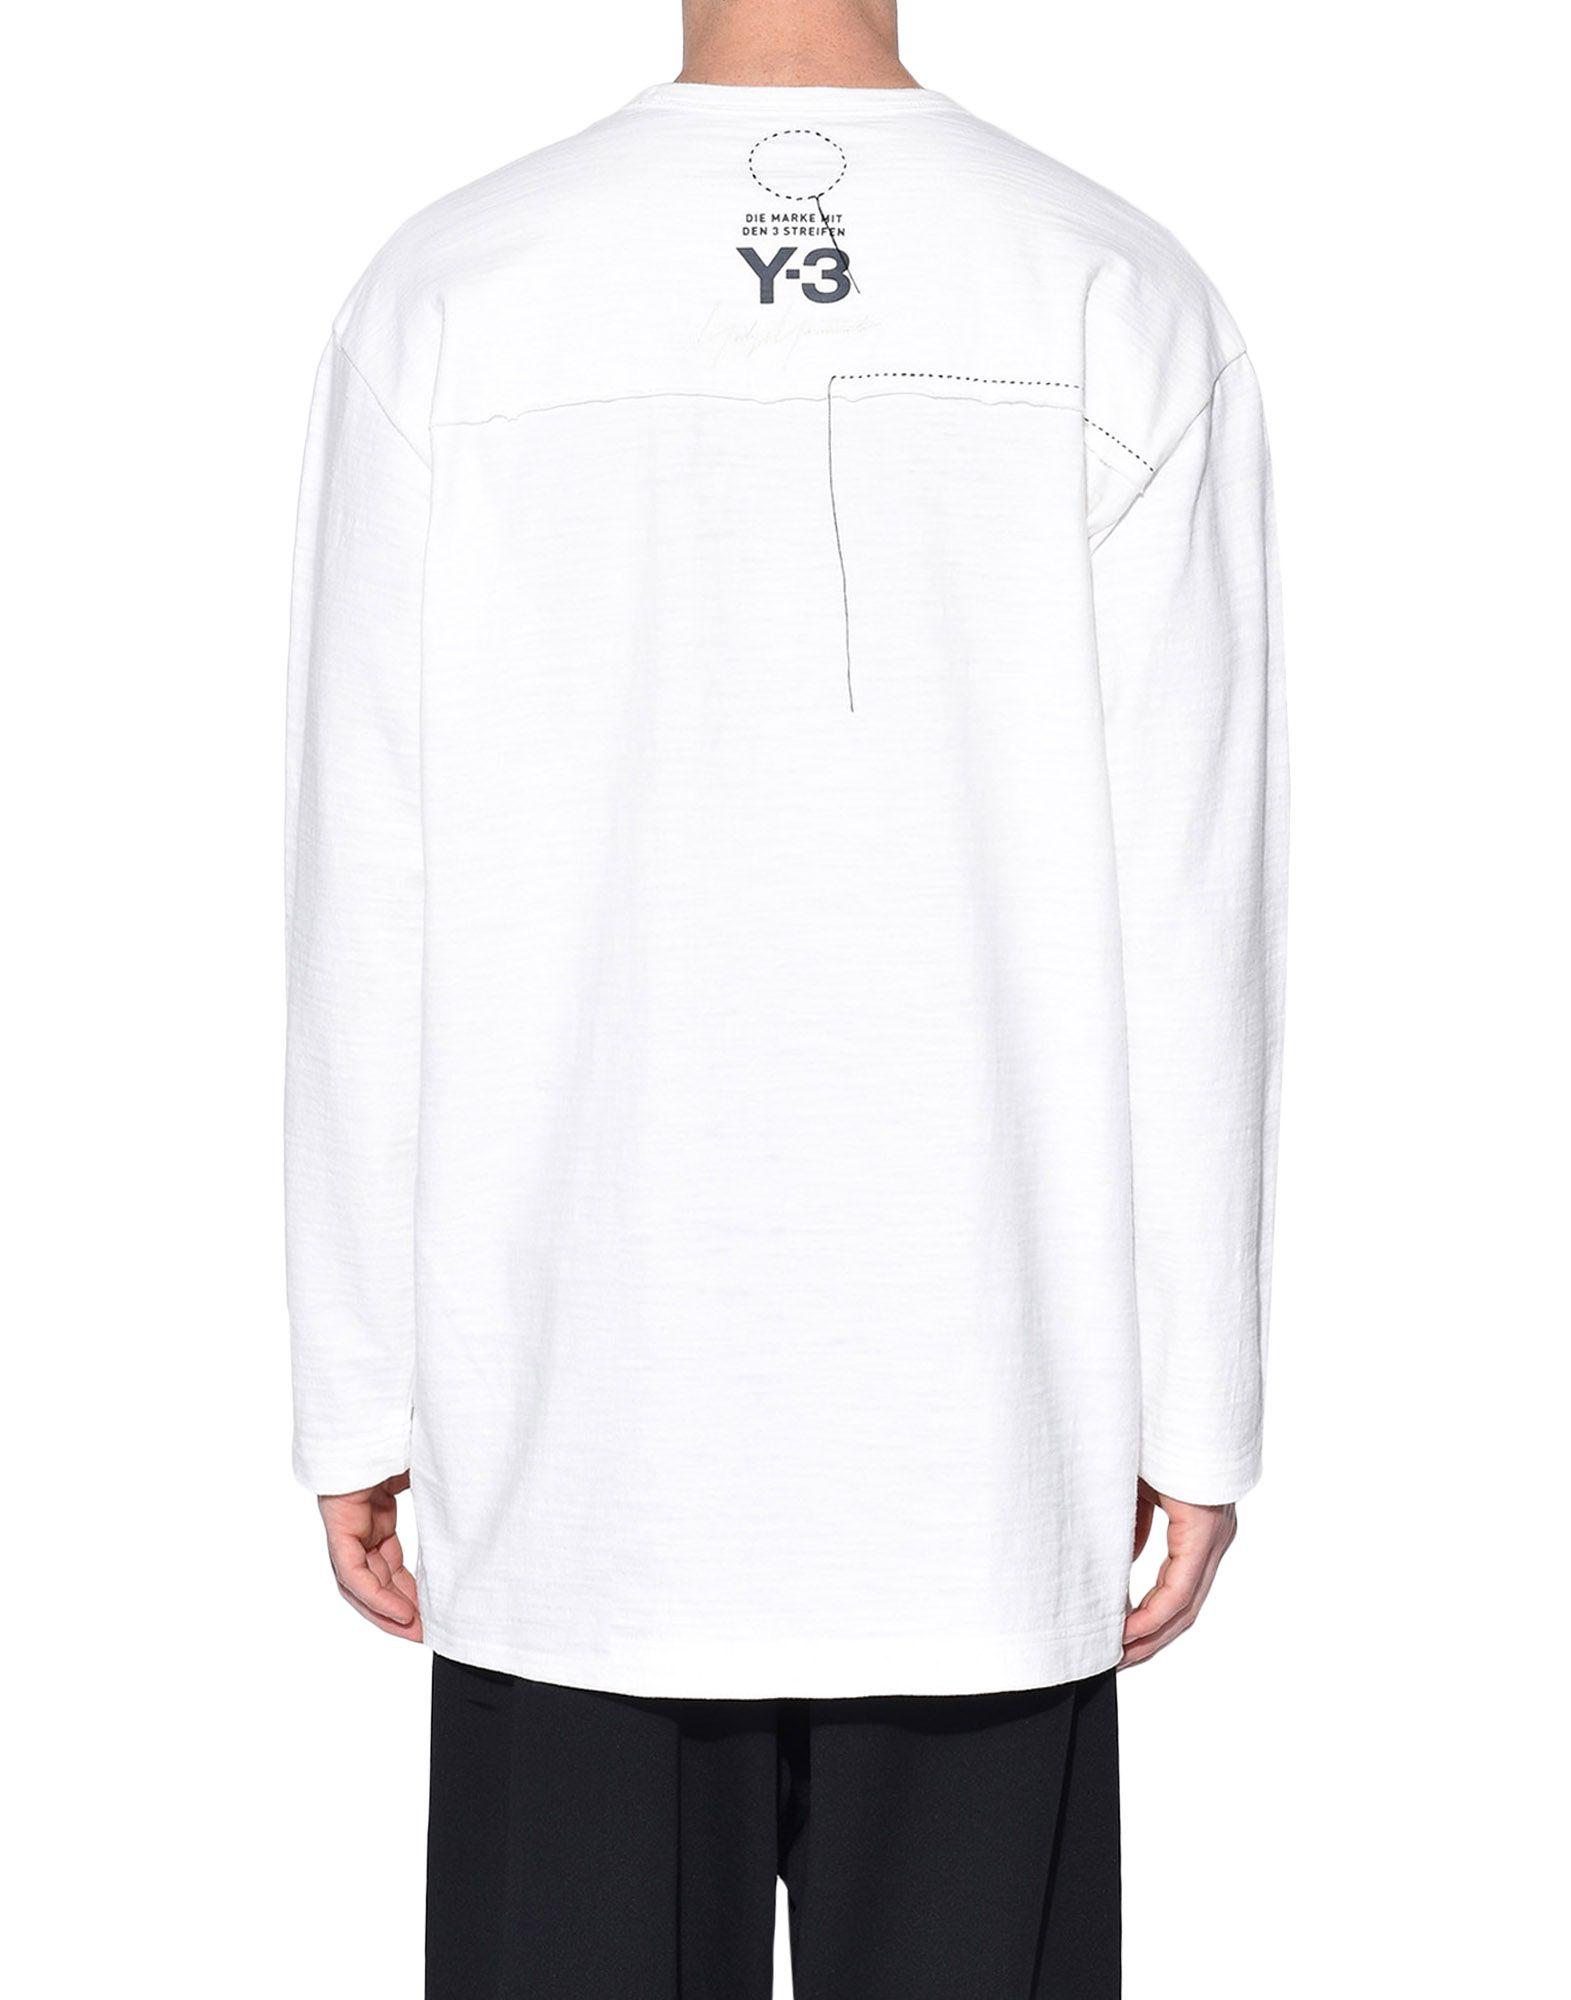 Y-3 Y-3 Sashiko Tee Long sleeve t-shirt Man e